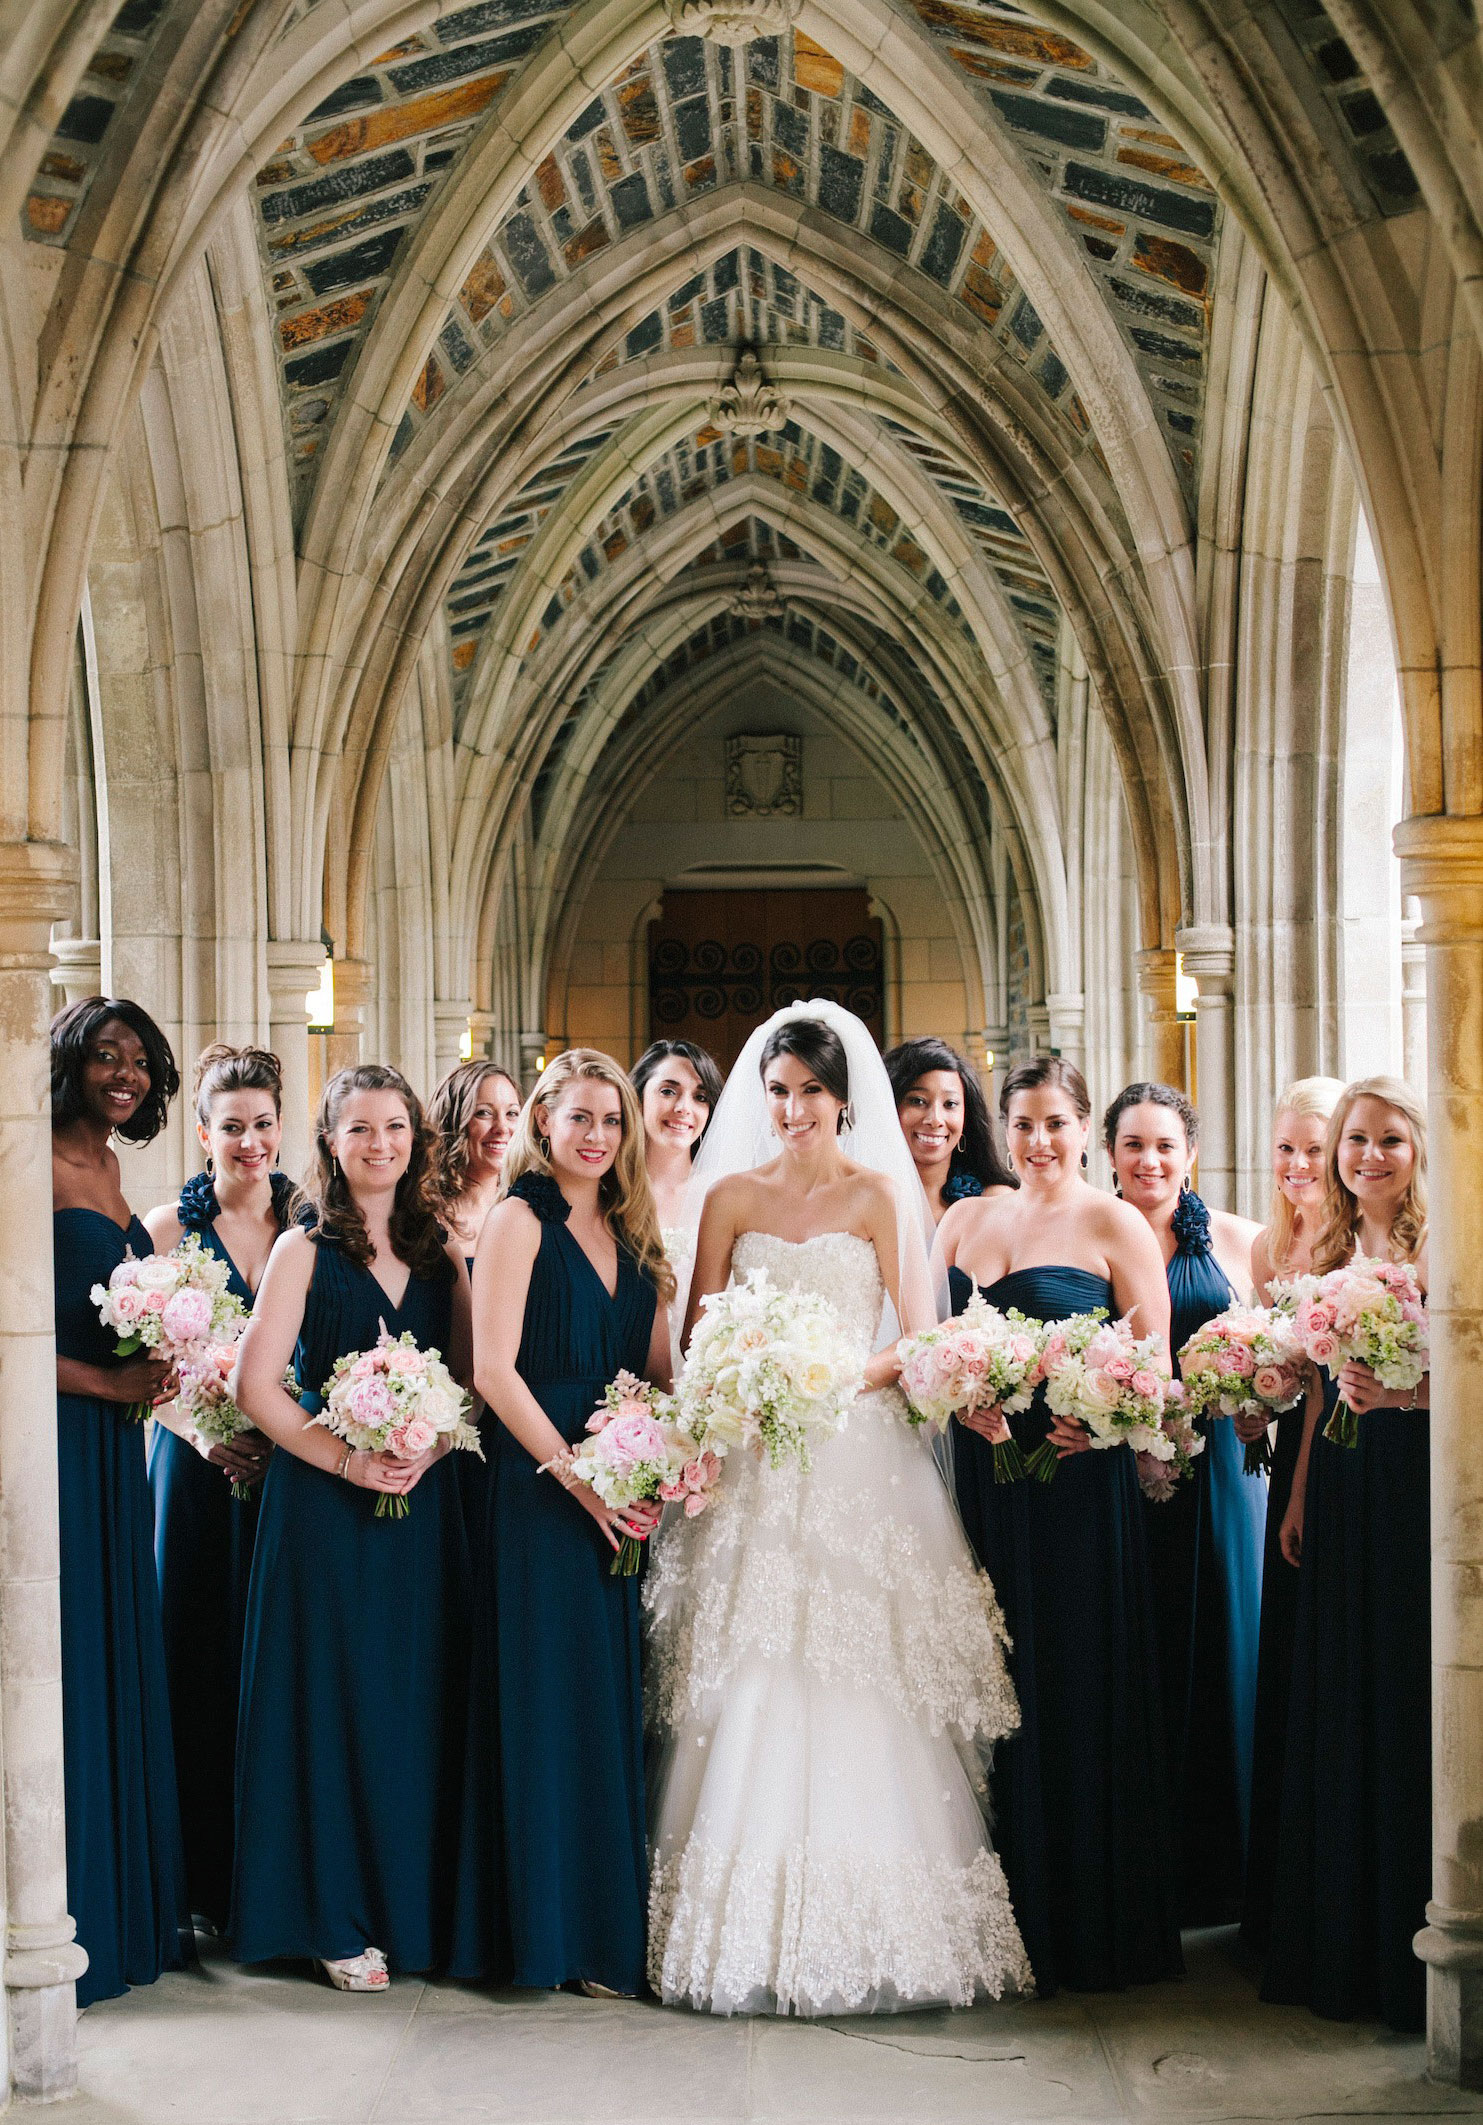 Bridesmaids different dresses same color navy blue